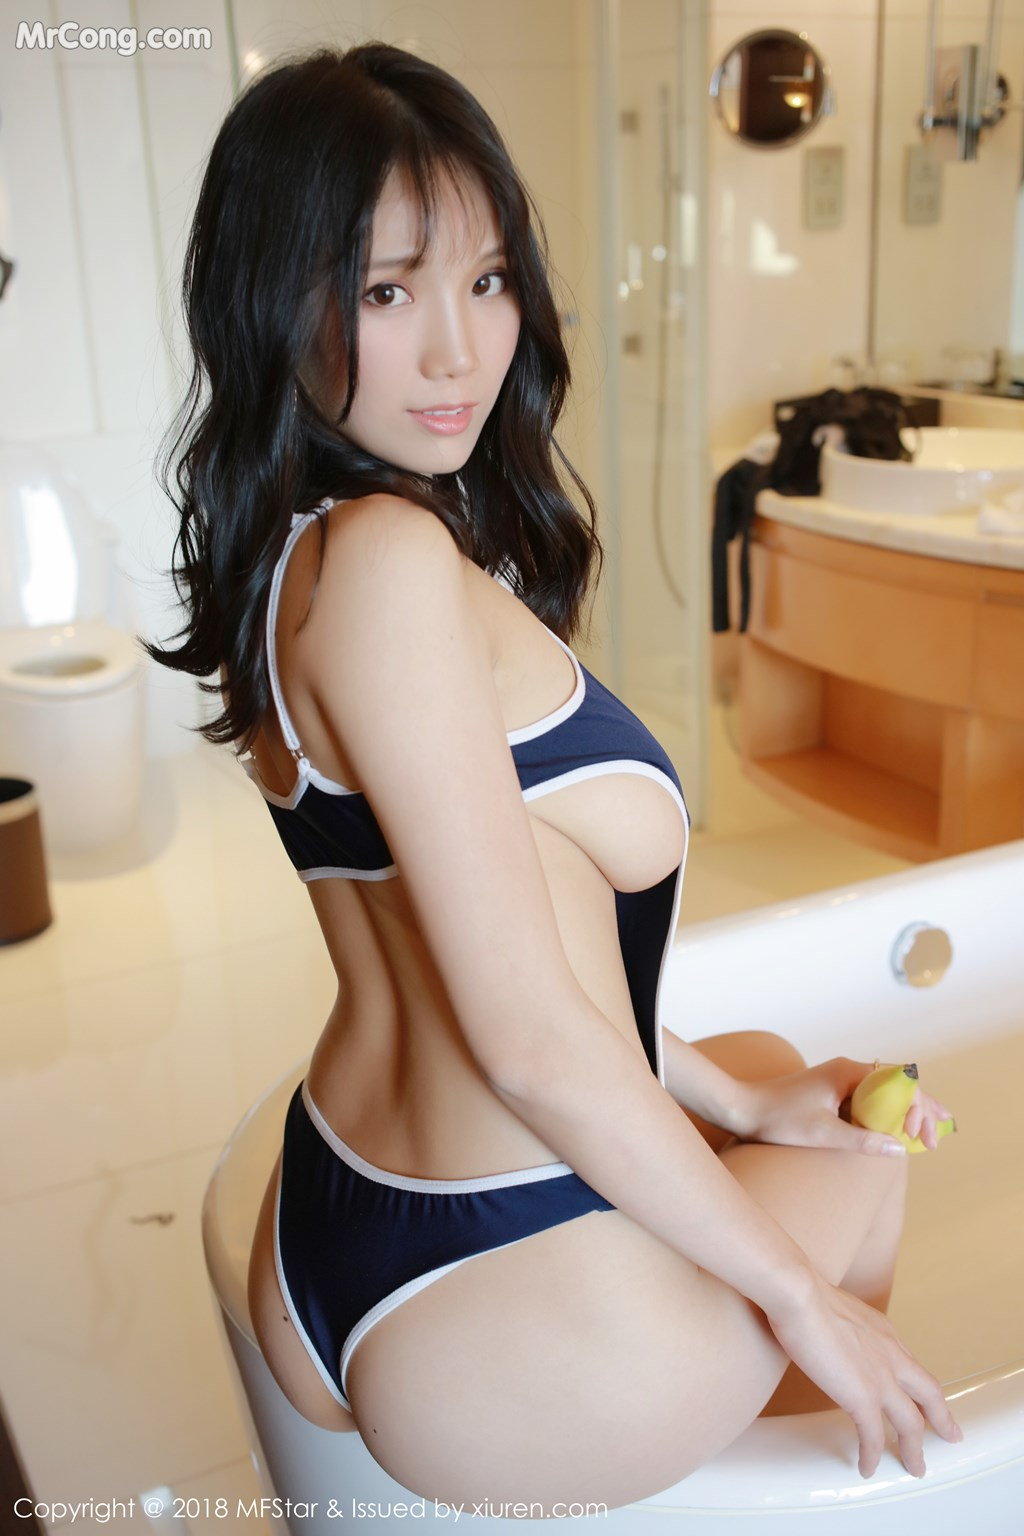 Image MFStar-Vol.155-Li-Ke-Ke-MrCong.com-006 in post MFStar Vol.155: Người mẫu Li Ke Ke (李可可) (46 ảnh)